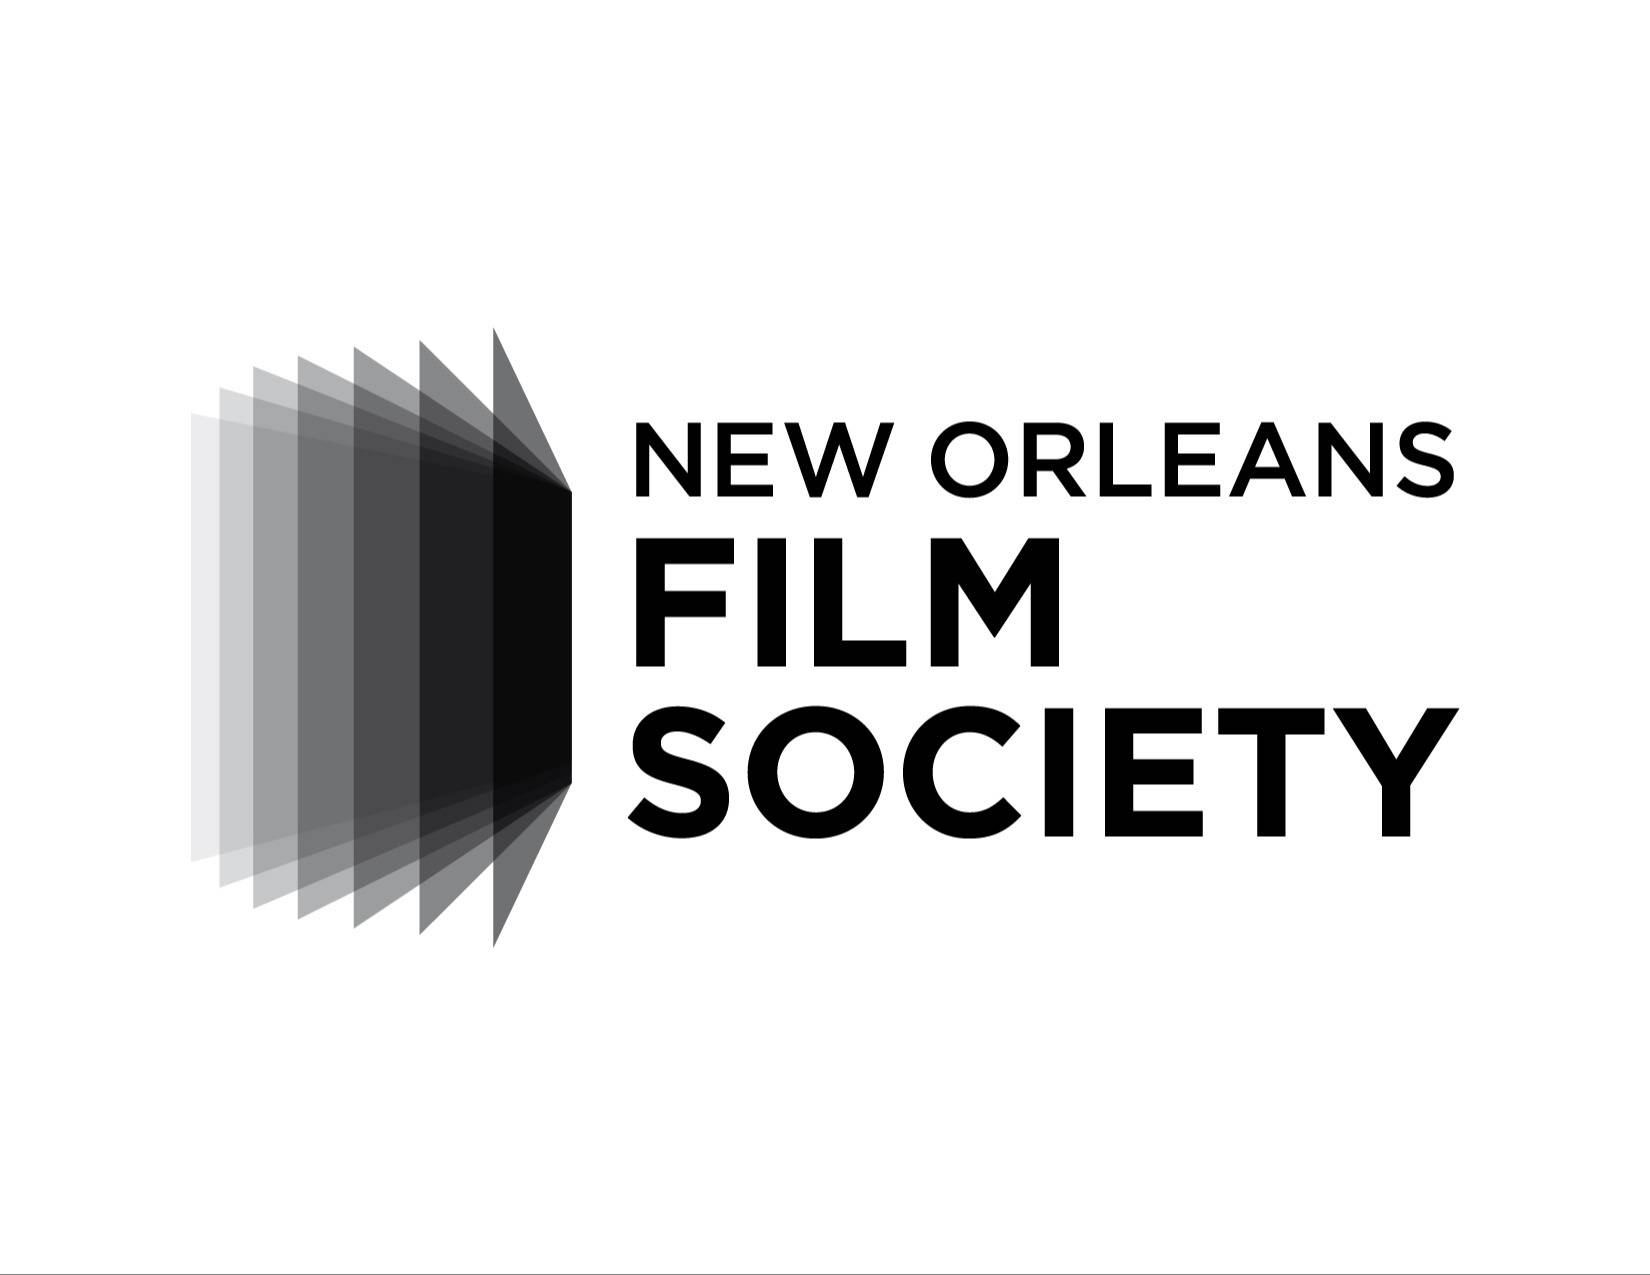 Logo of New Orleans Film Society